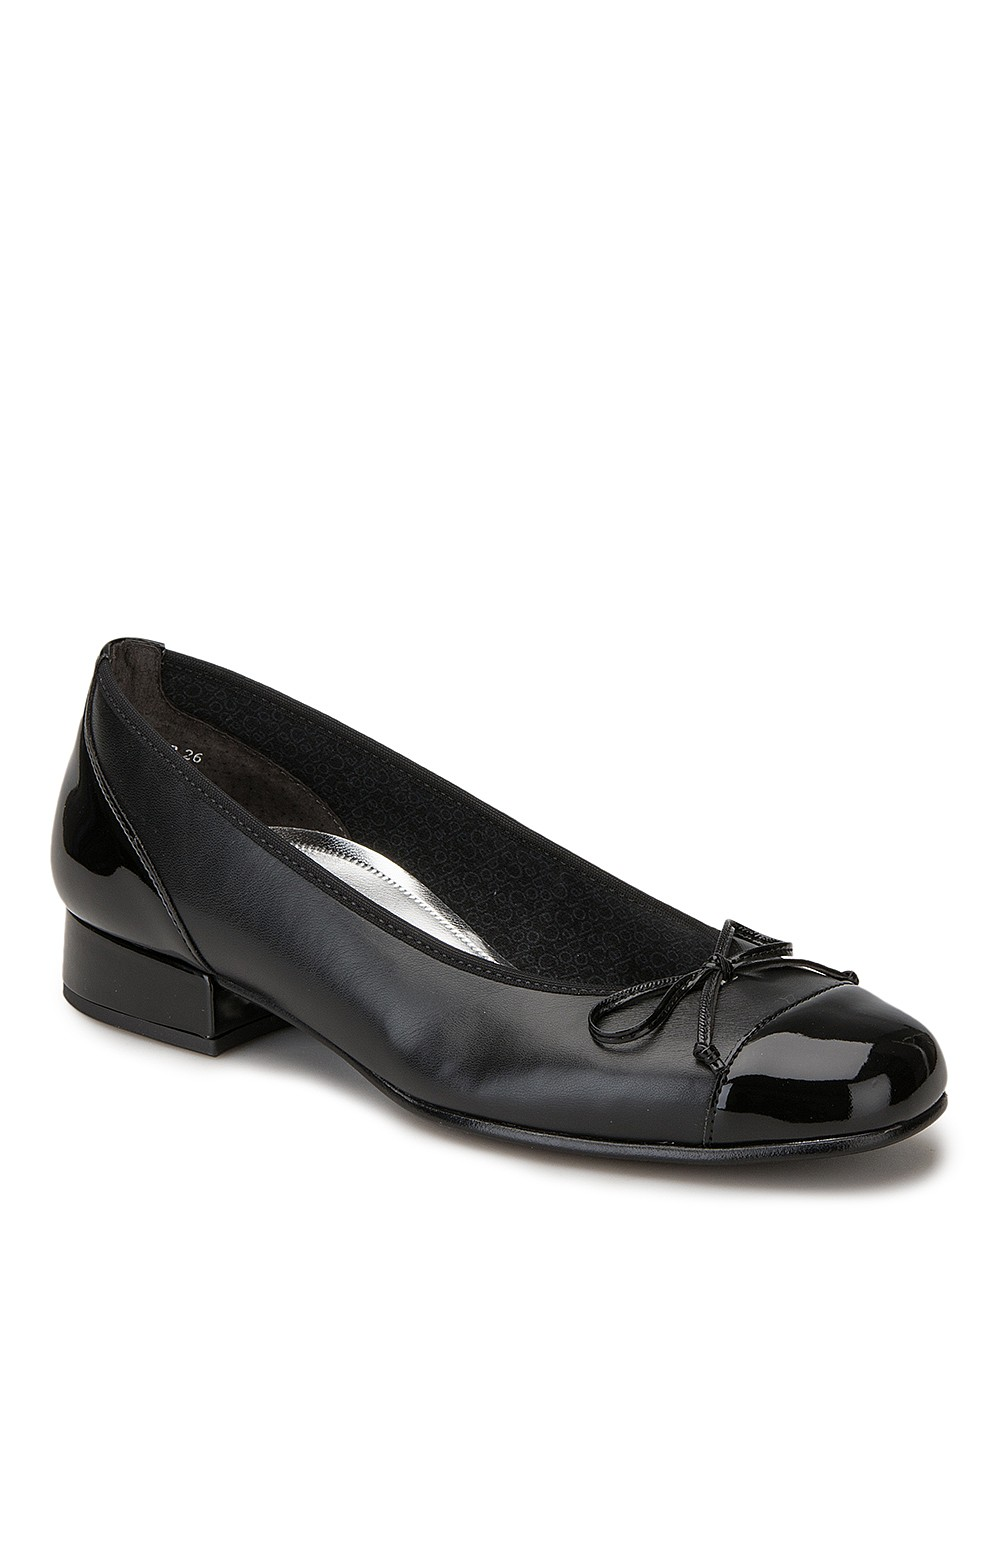 61f793375639e Gabor Patent Toe/Leather Pump - House of Bruar